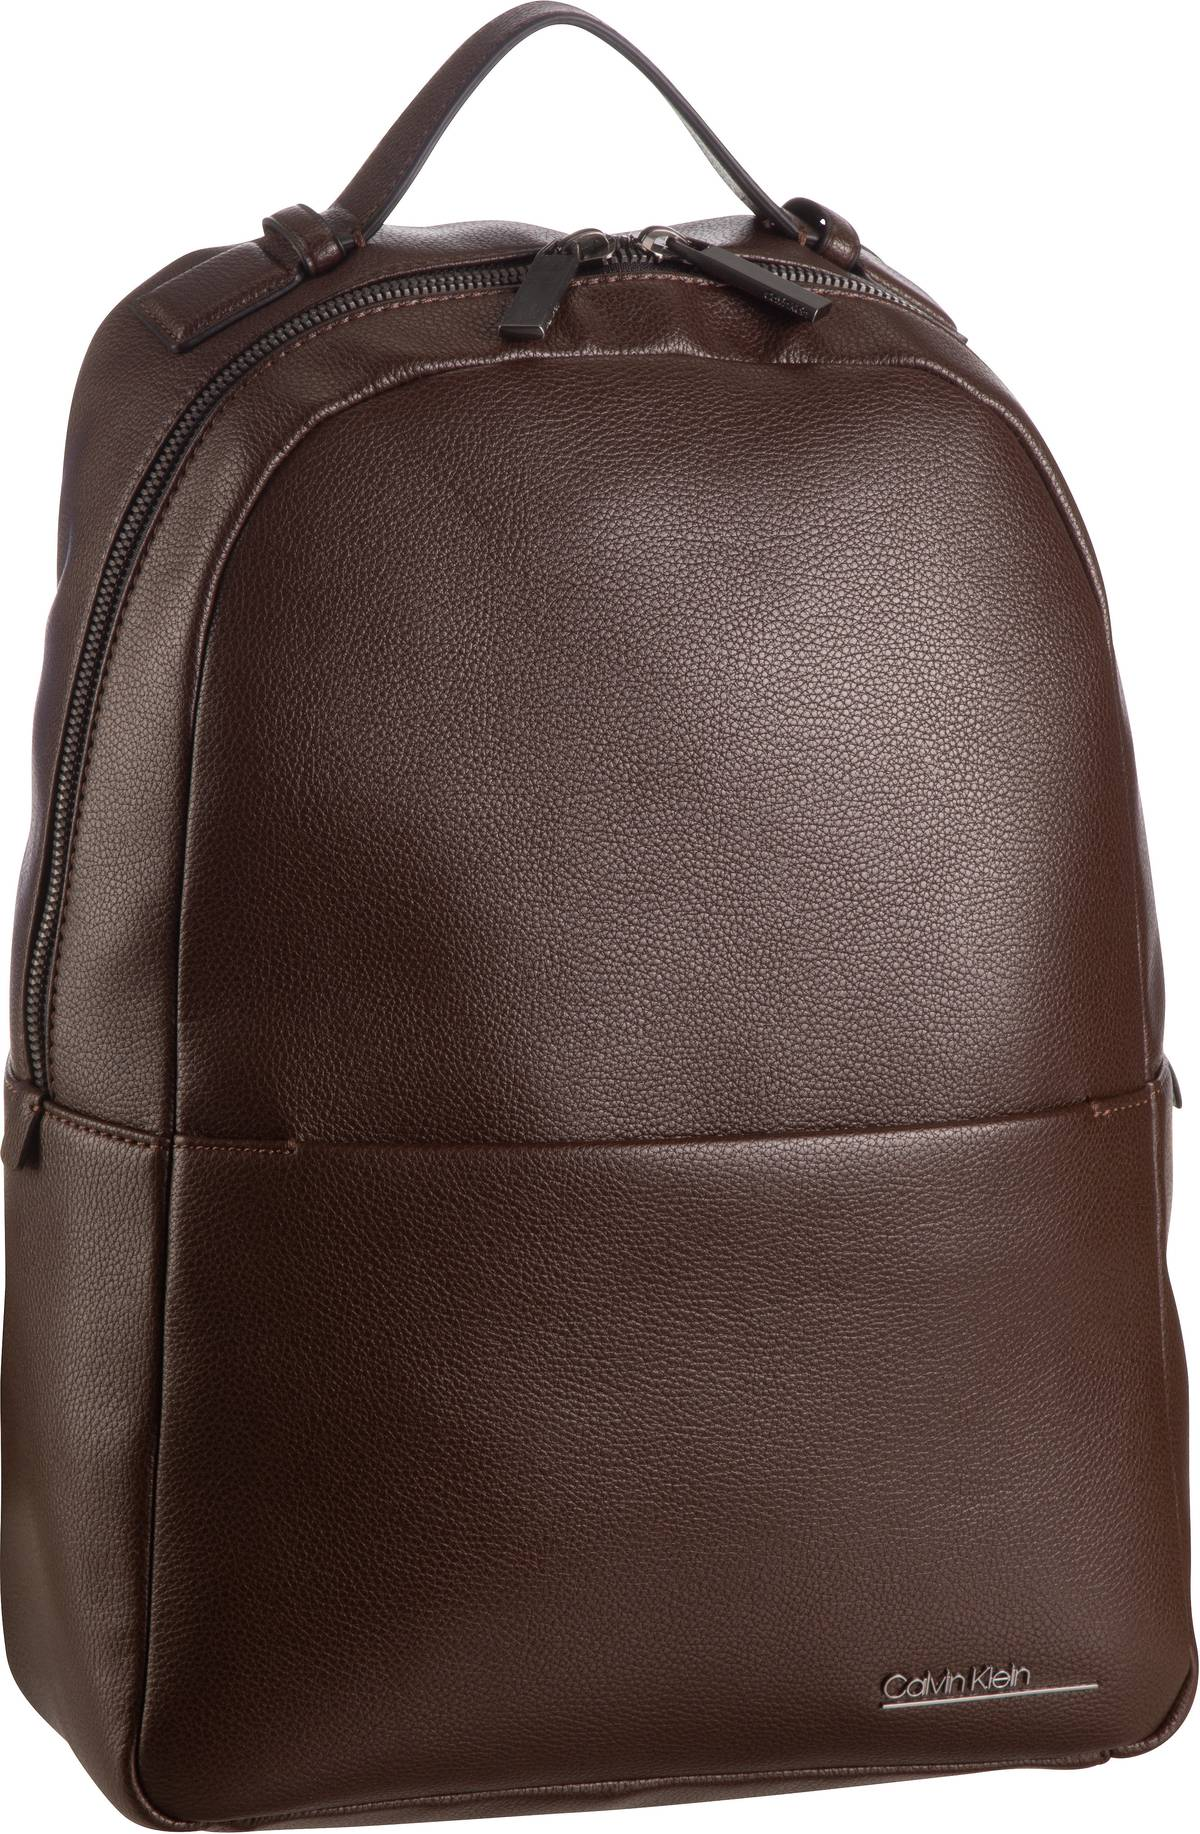 Rucksack / Daypack CK Bombe' Backpack SP20 Mahogany